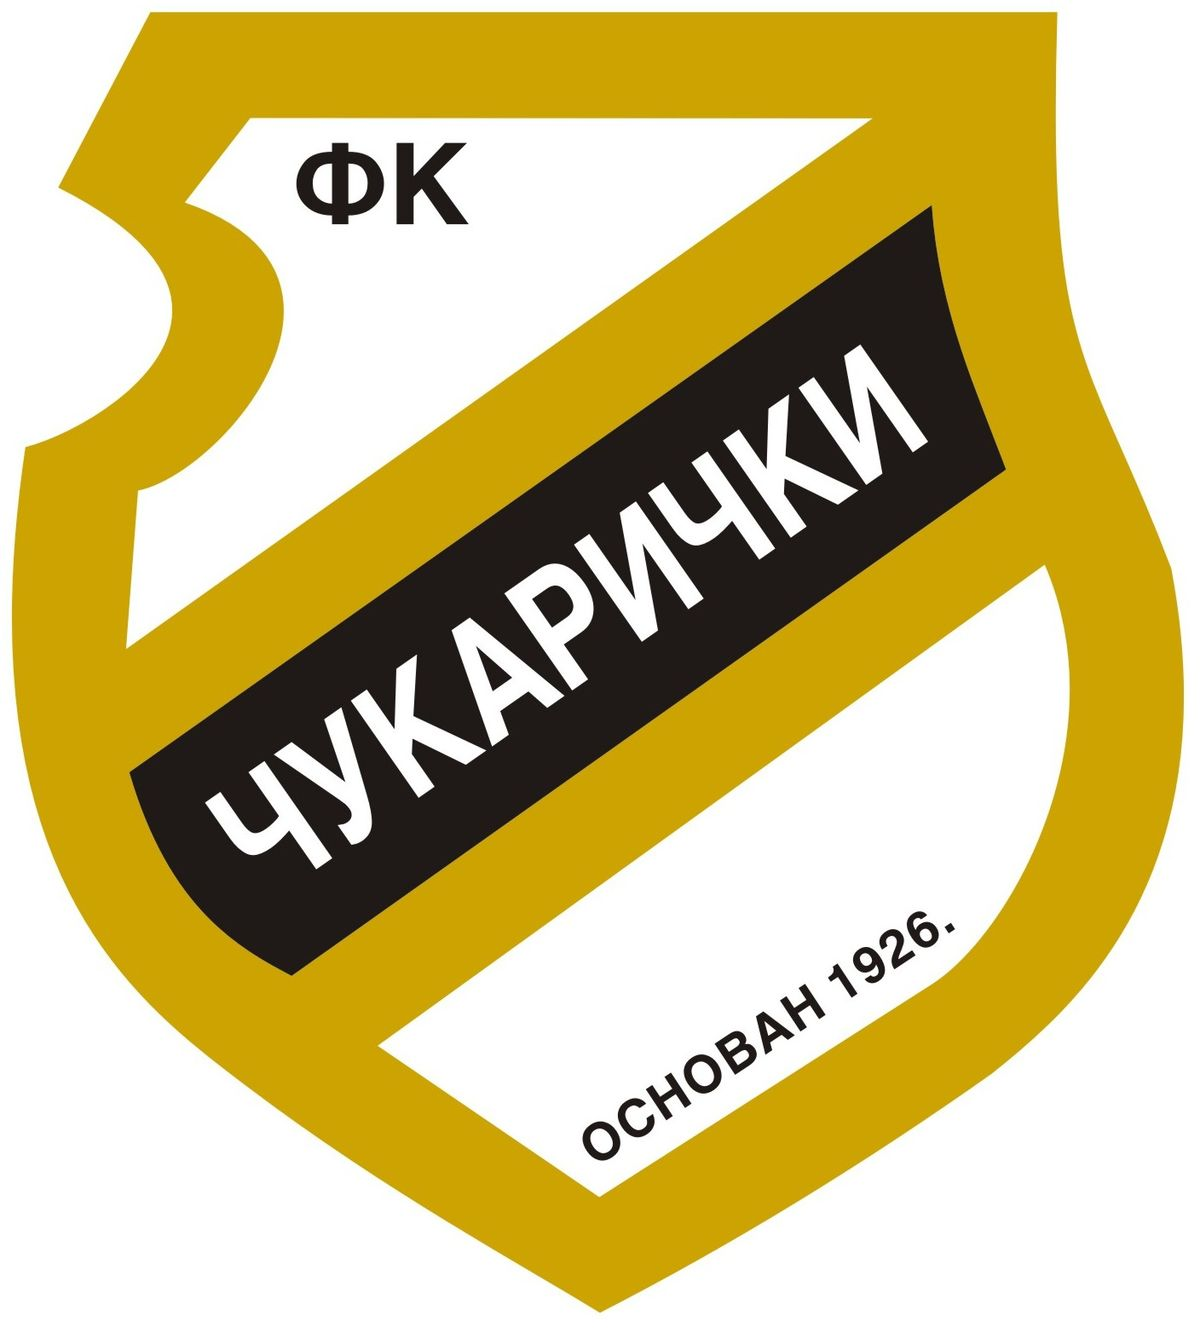 fk �ukari�ki � vikipedija slobodna enciklopedija